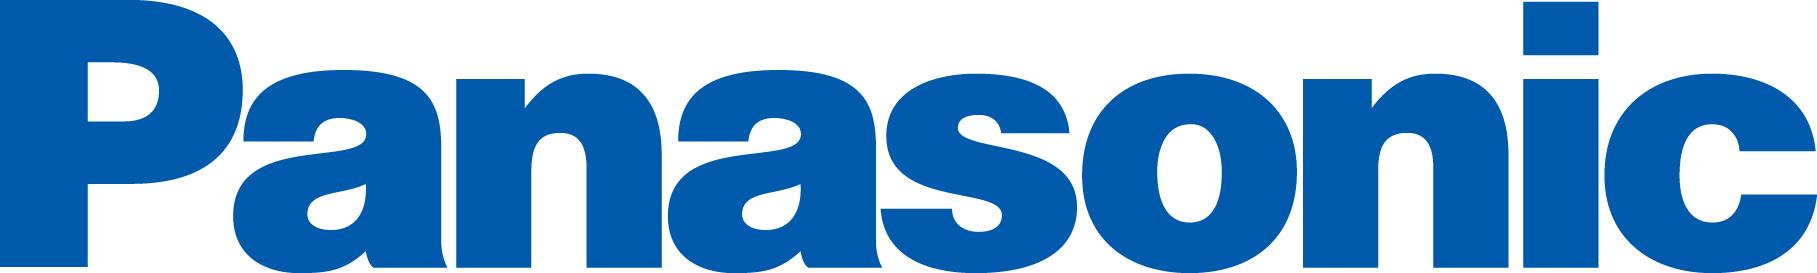 Panasonic Logo Blue